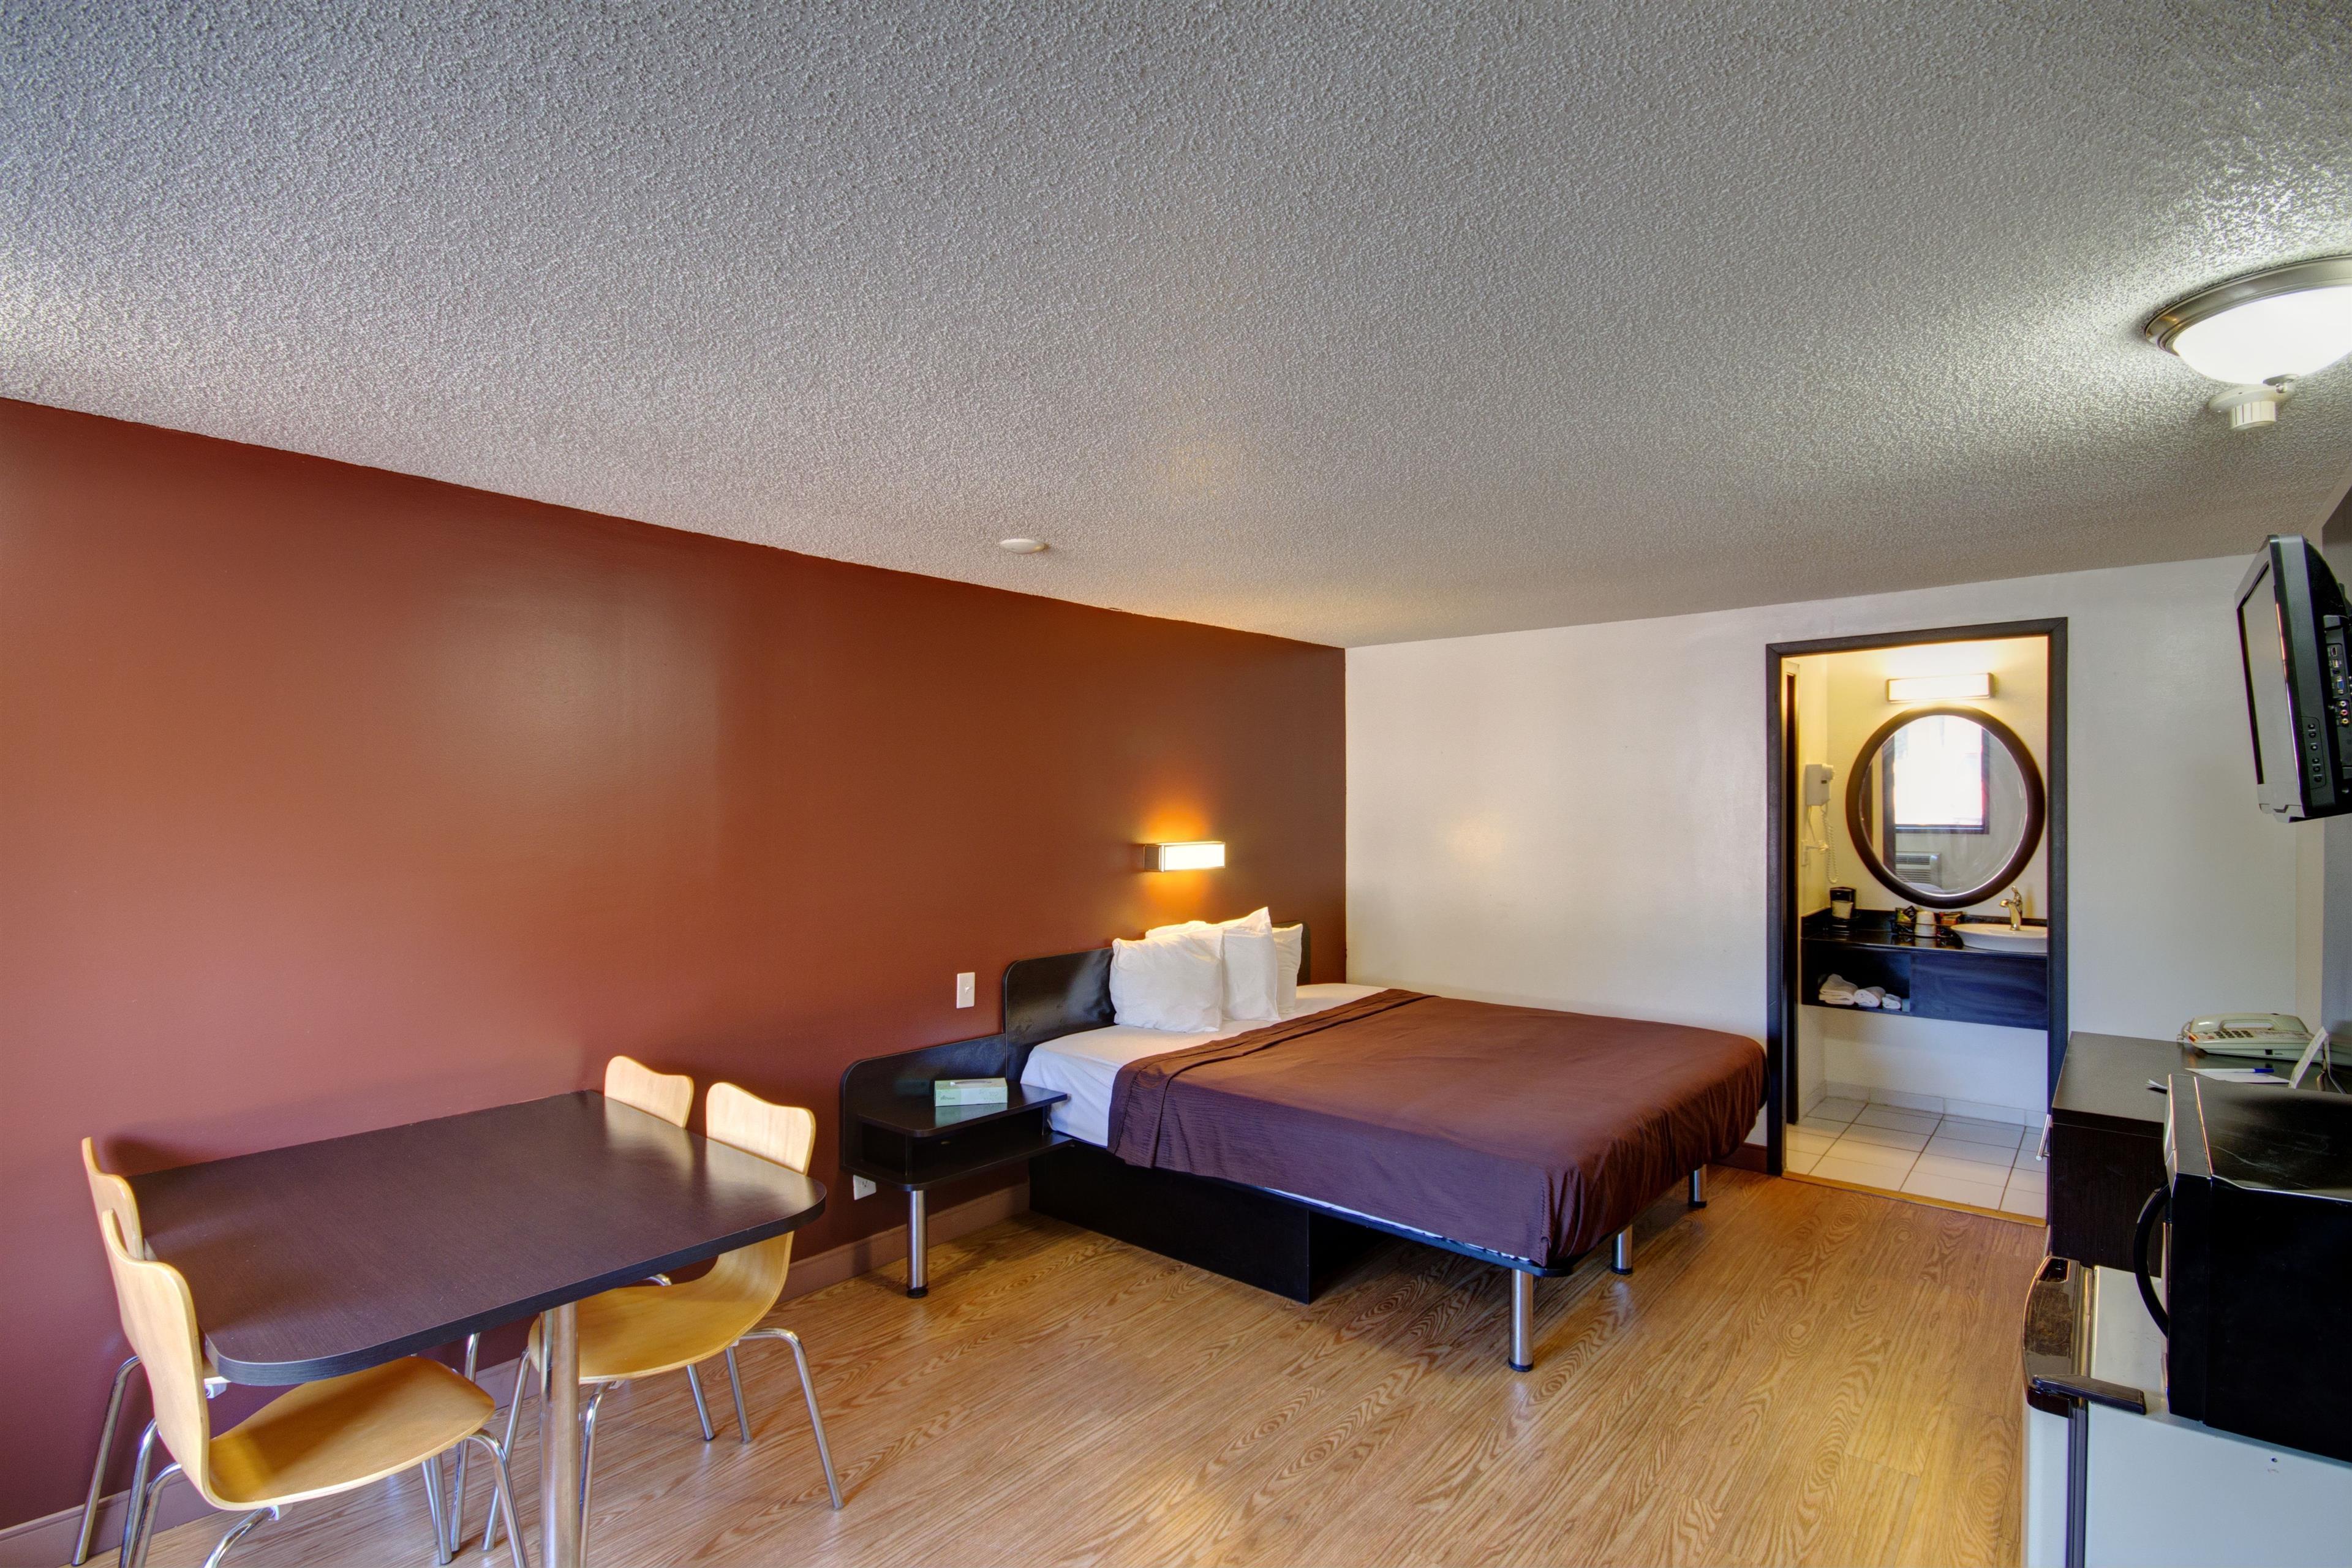 Americas Best Value Inn - Heath/Newark image 10